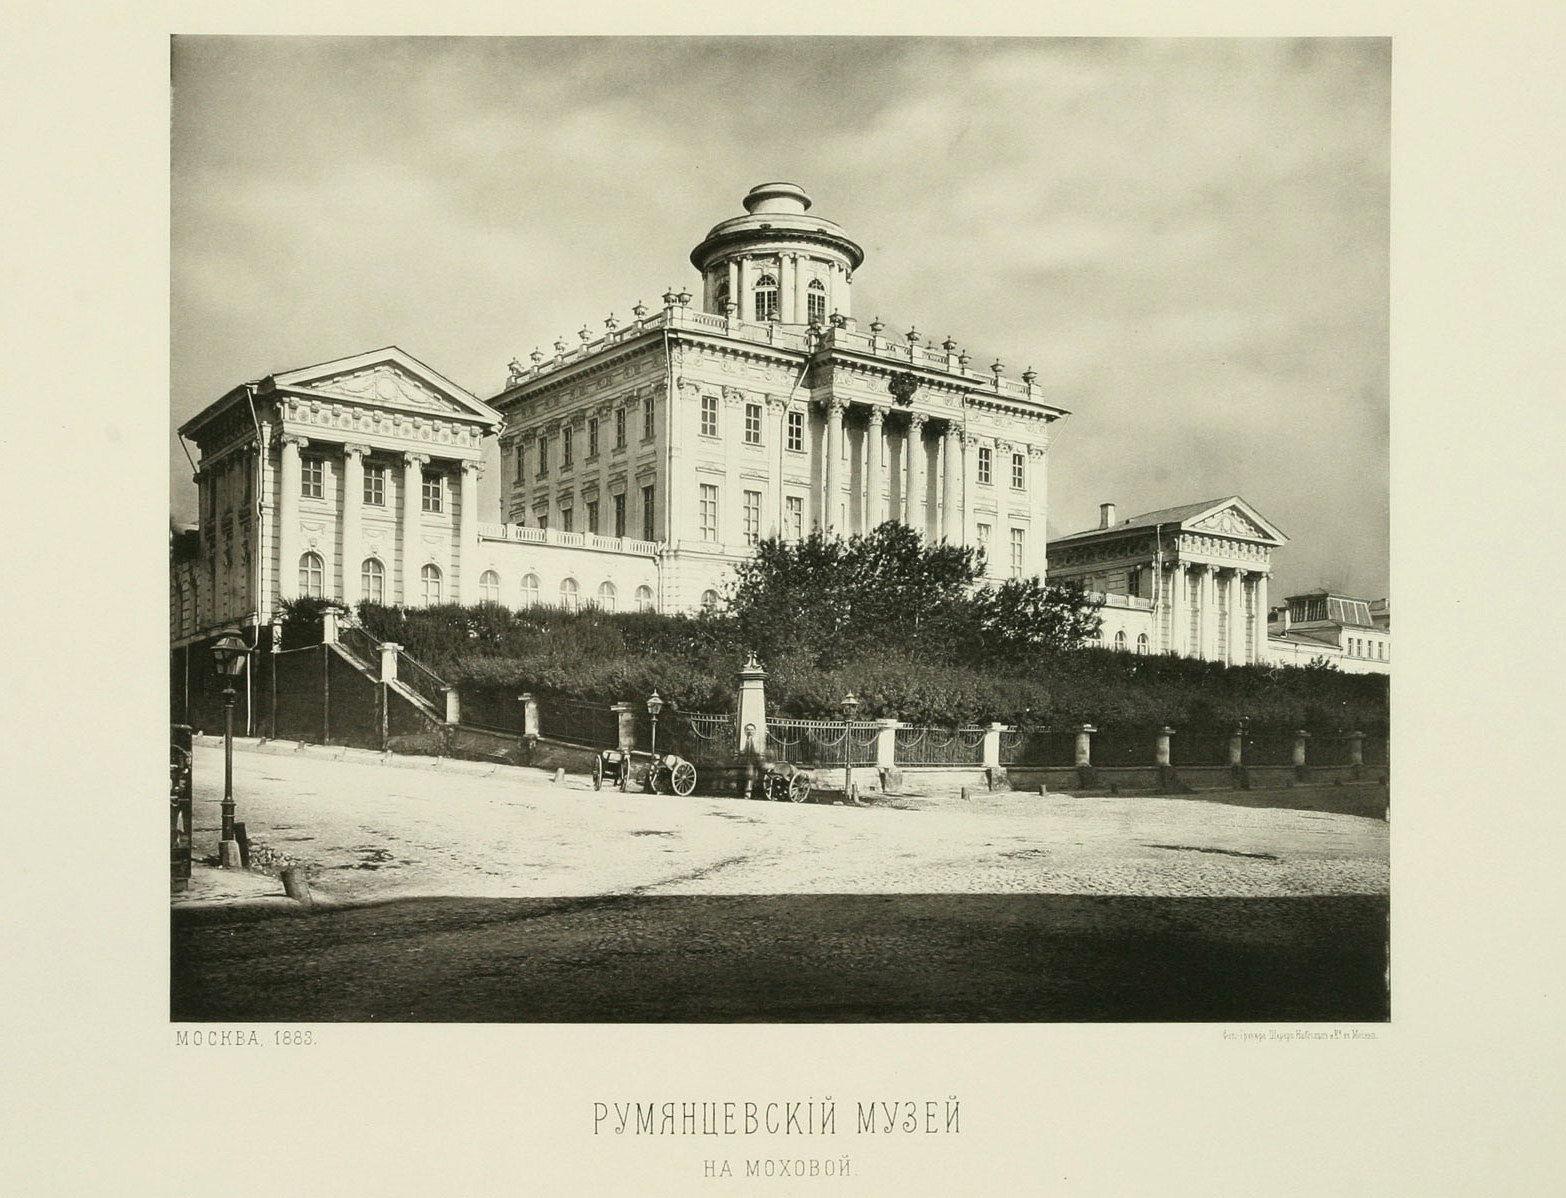 Дом Пашкова, Румянцевский музей